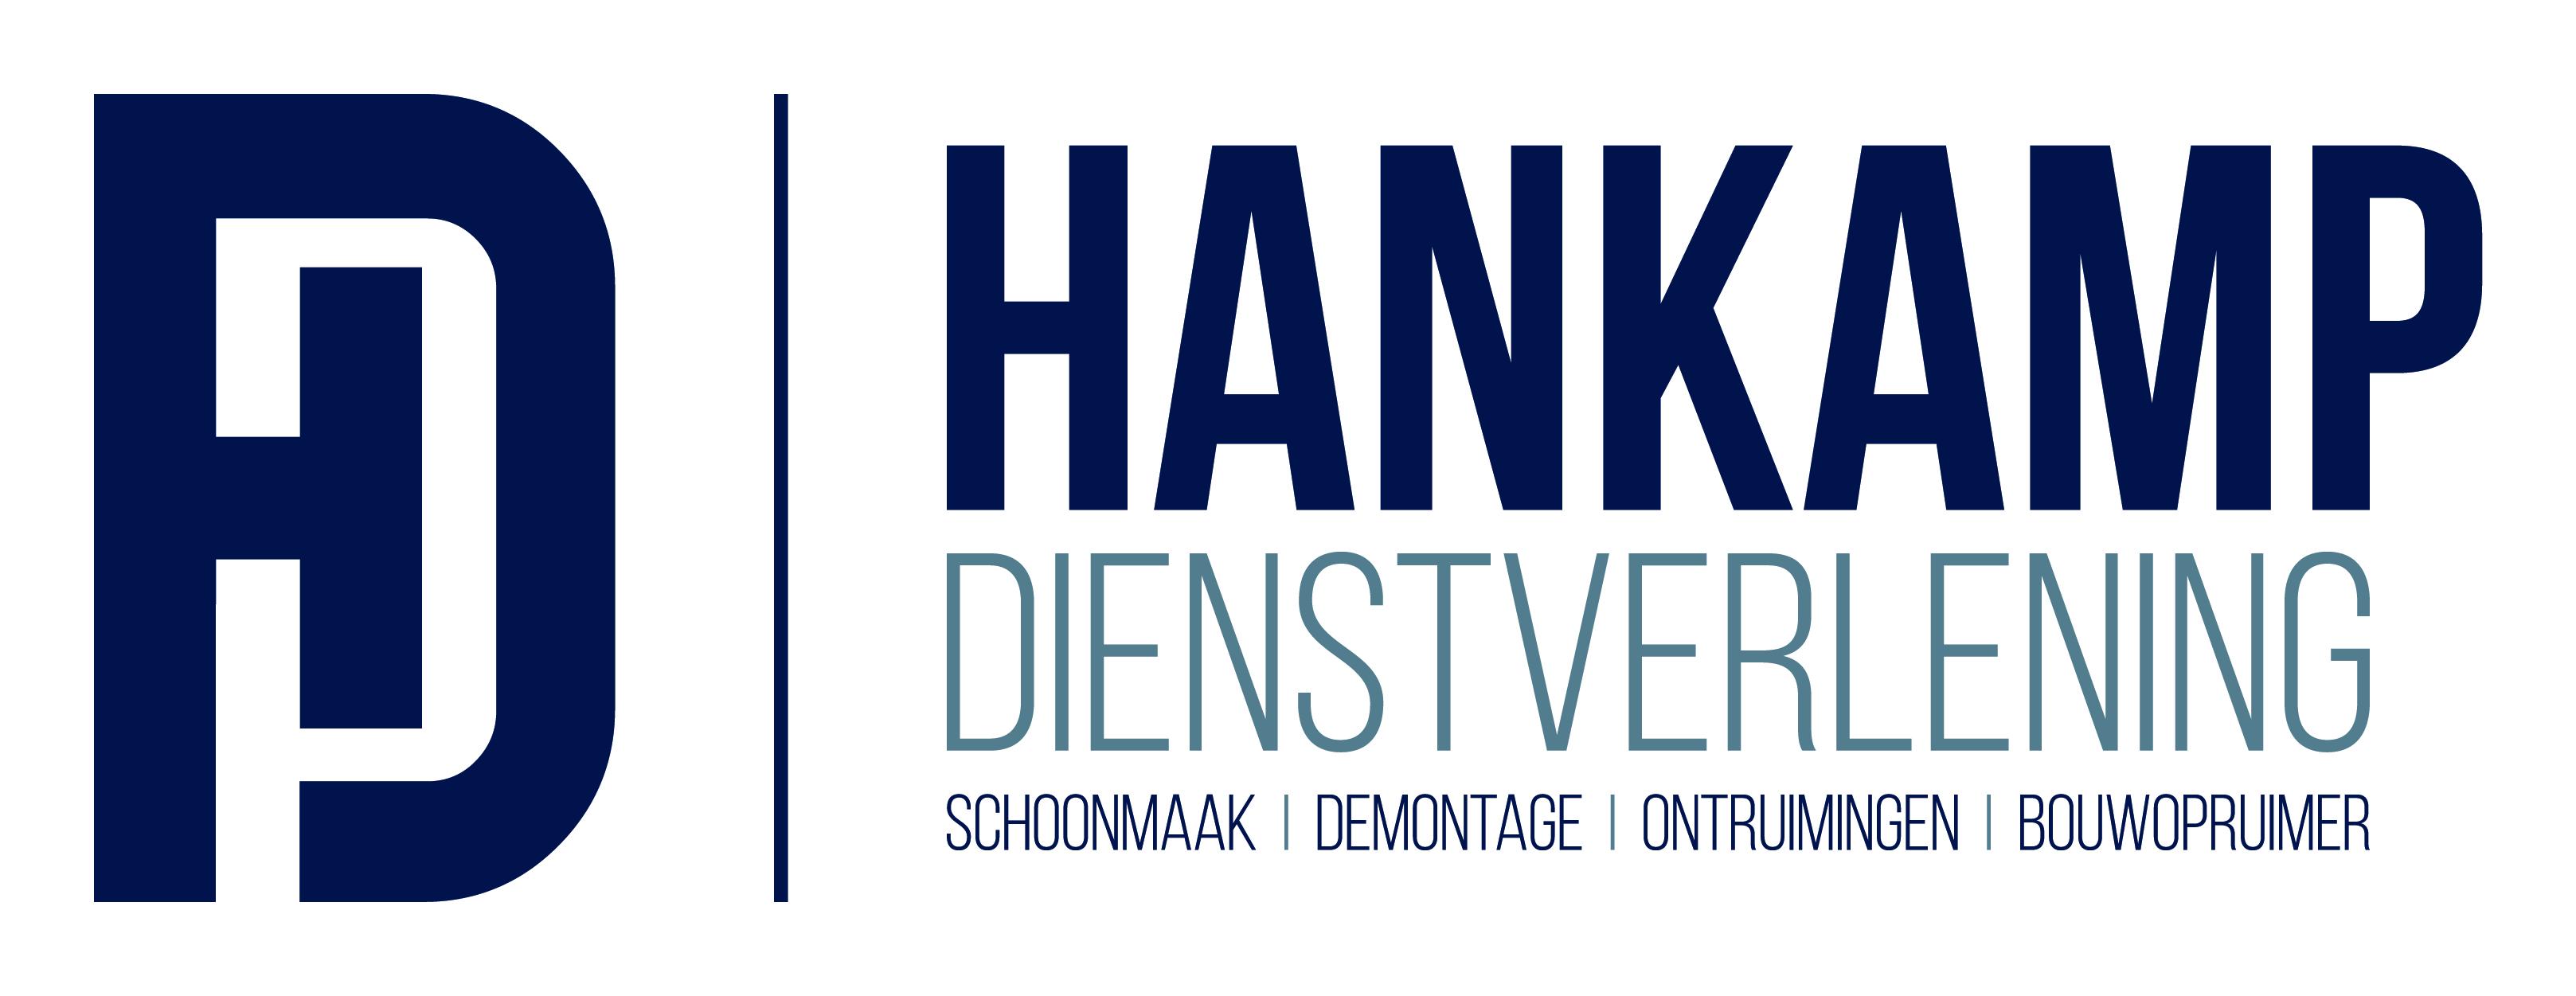 Dinand Hankamp